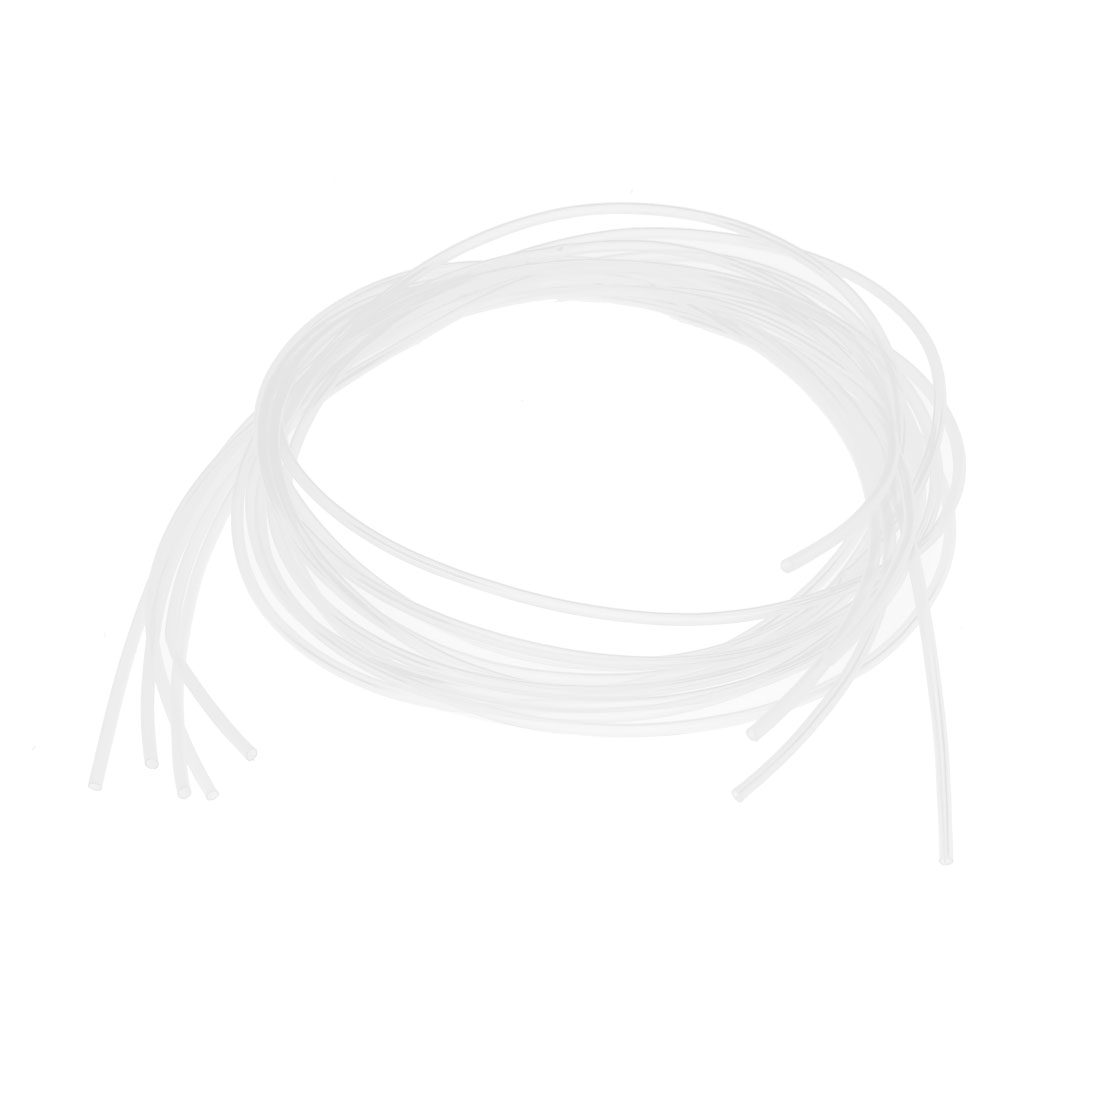 2:1 Shrink Ratio 1M 3.3Ft Clear Flexible Heat Shrinkable Tubing 5pcs